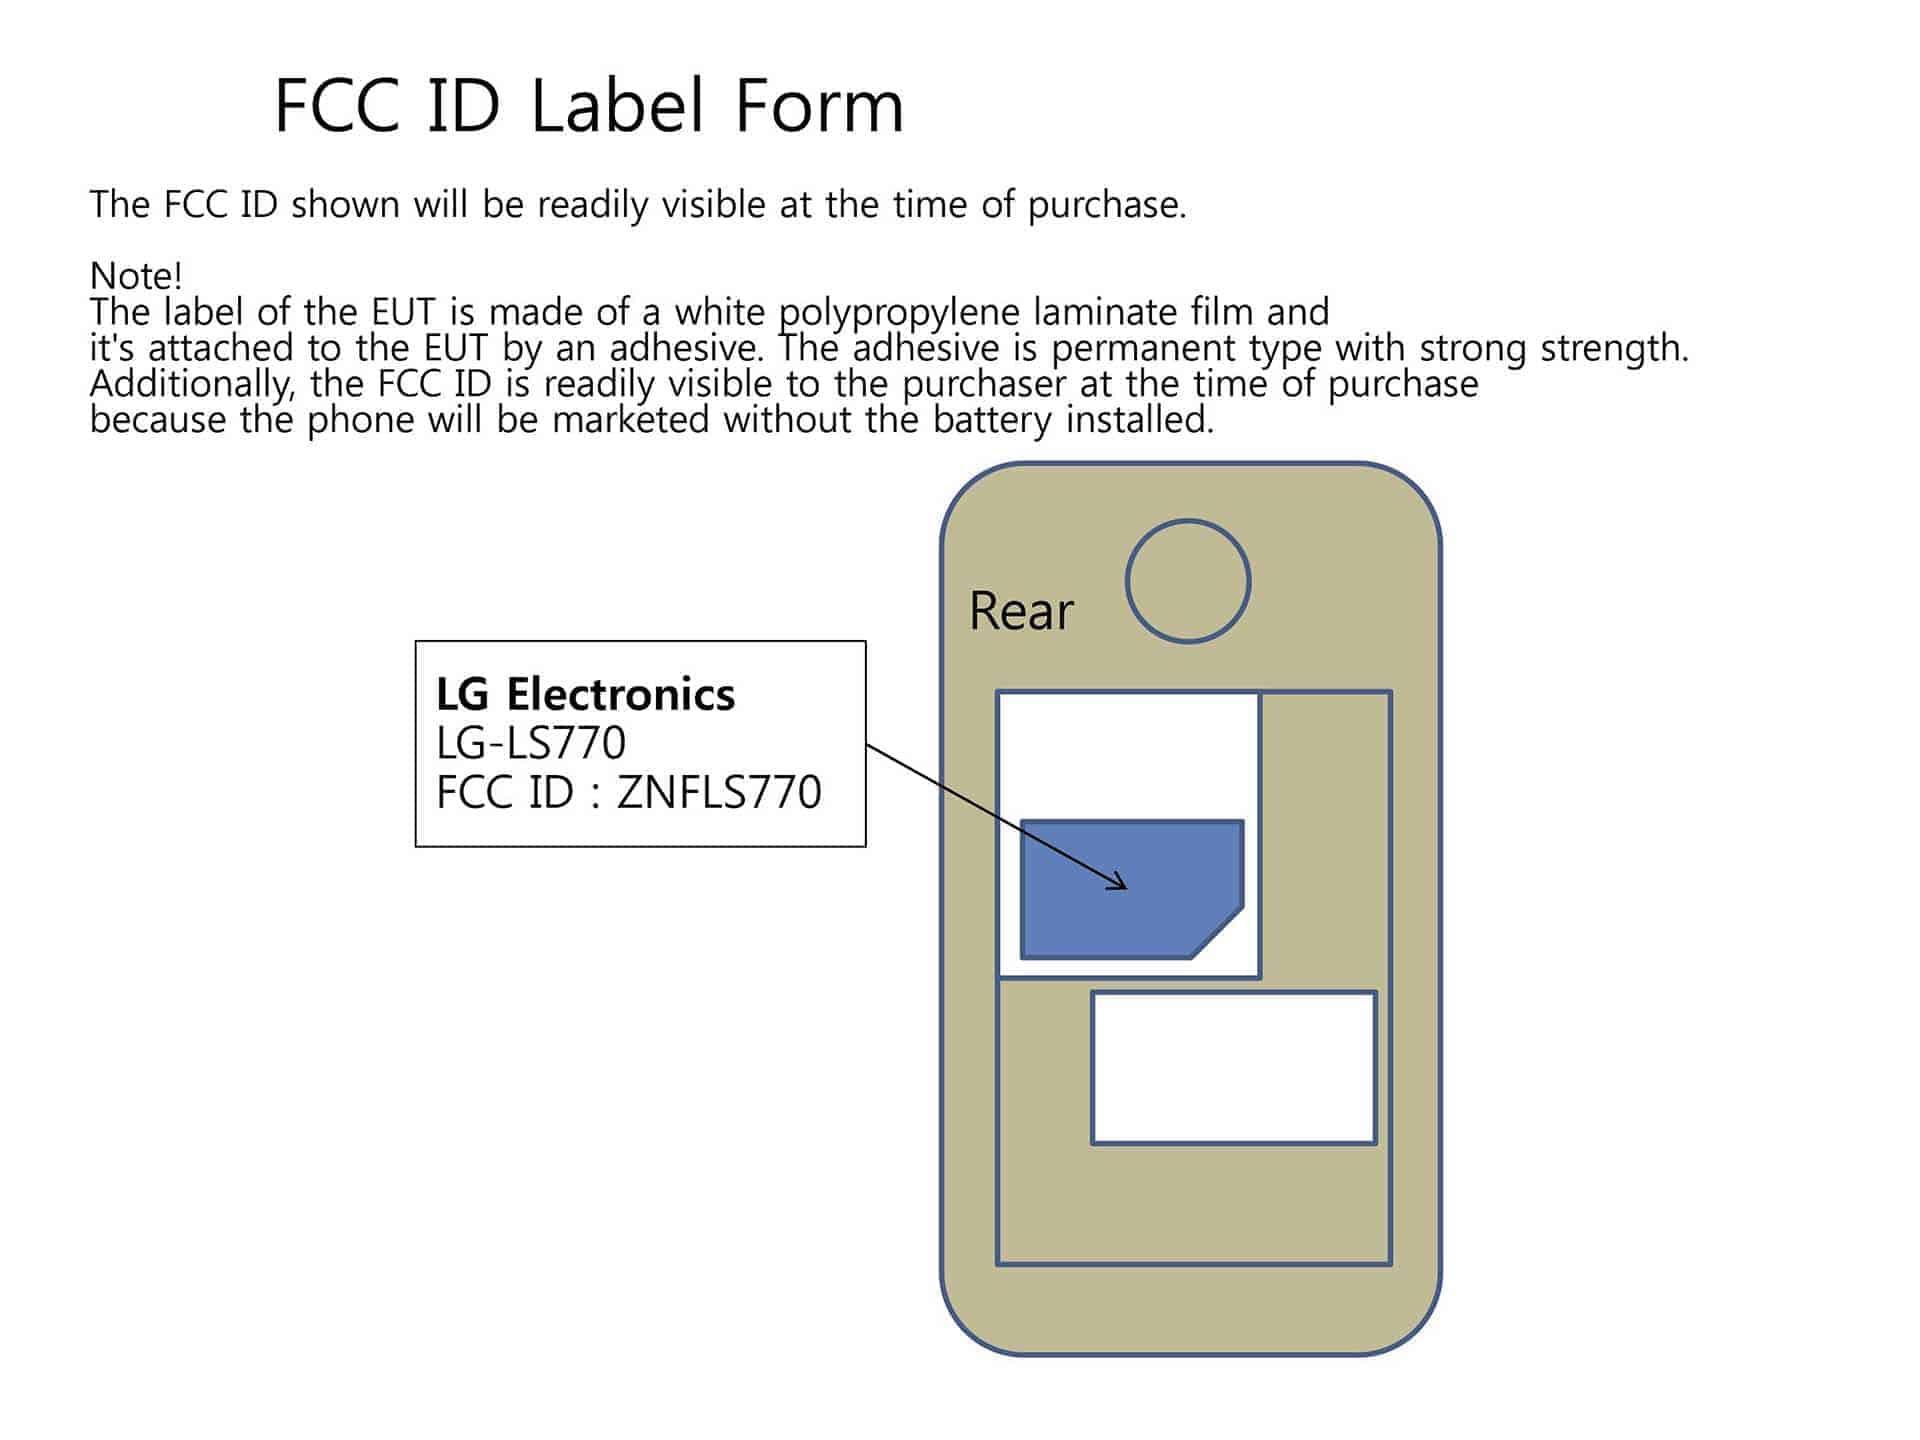 LGMS395 FCC ID Label Form